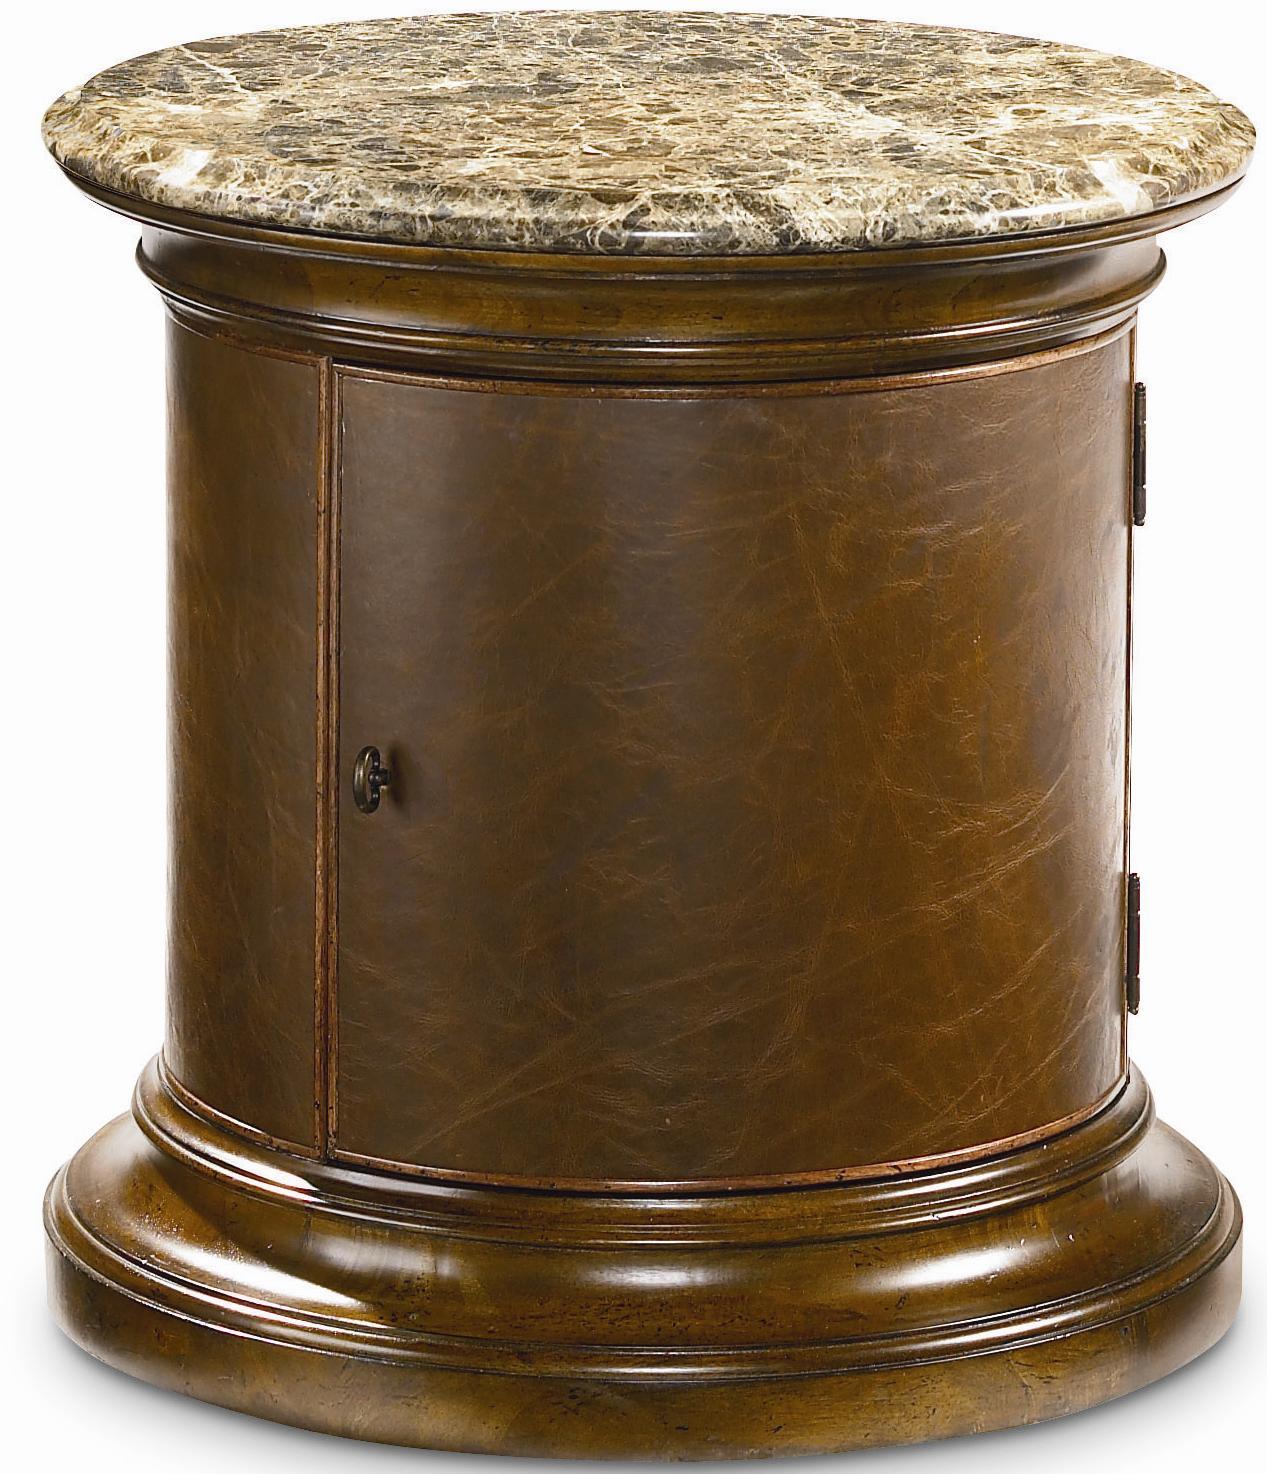 Thomasville® Ernest Hemingway  Tribal Drum Table - Item Number: 46291-330